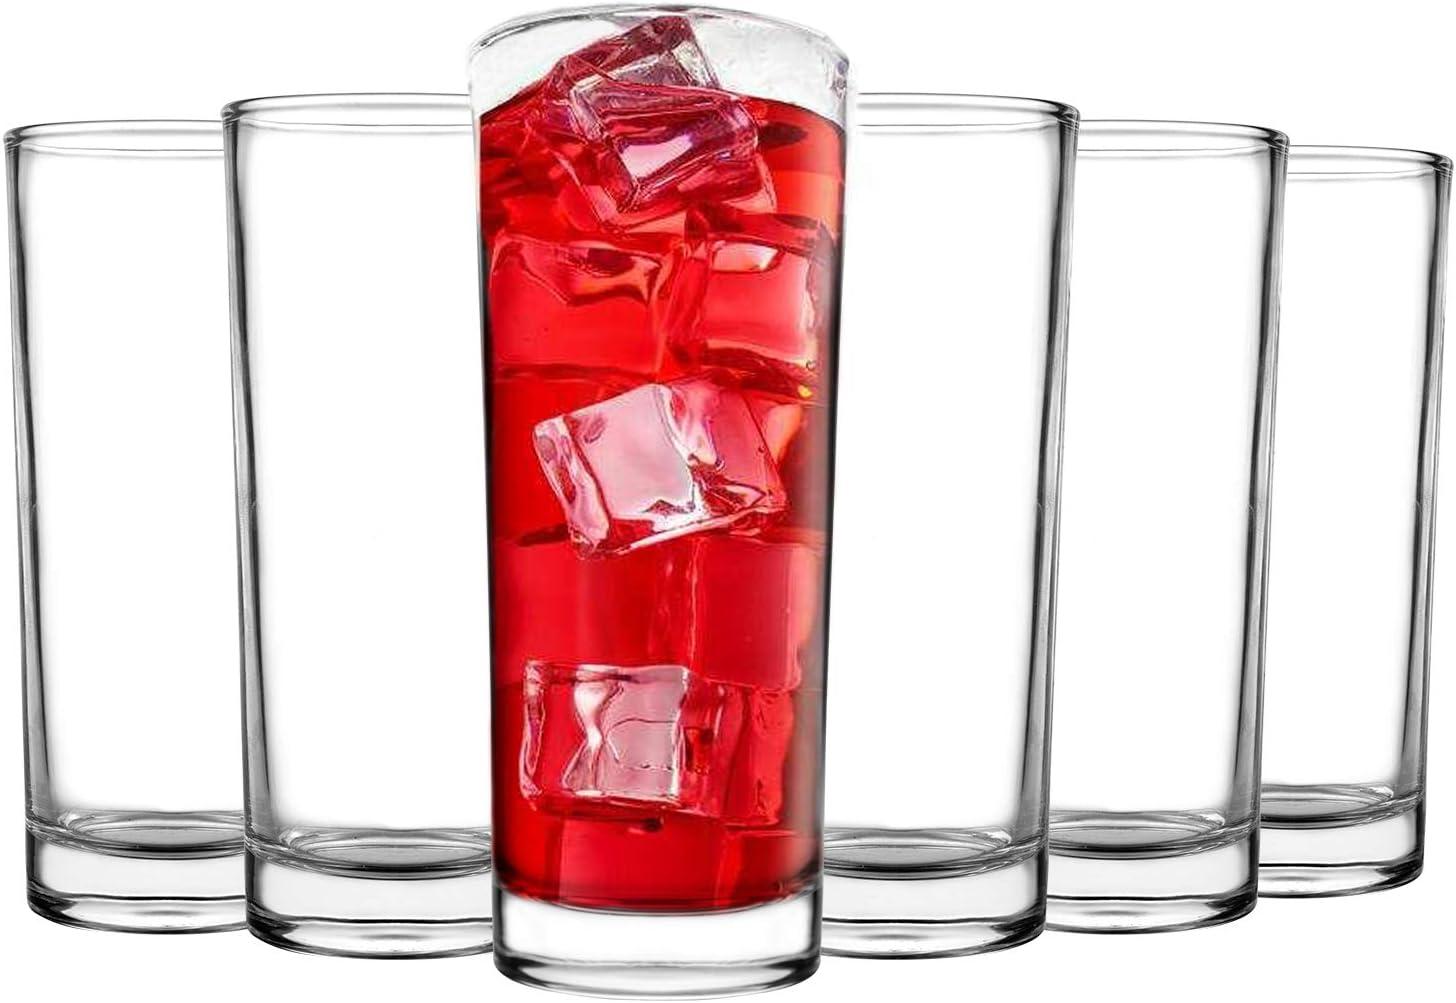 Tebery 6 Pack Clear Heavy Base Highball Glasses Drink Glasses Tumbler Beverage Set (11 Ounce)